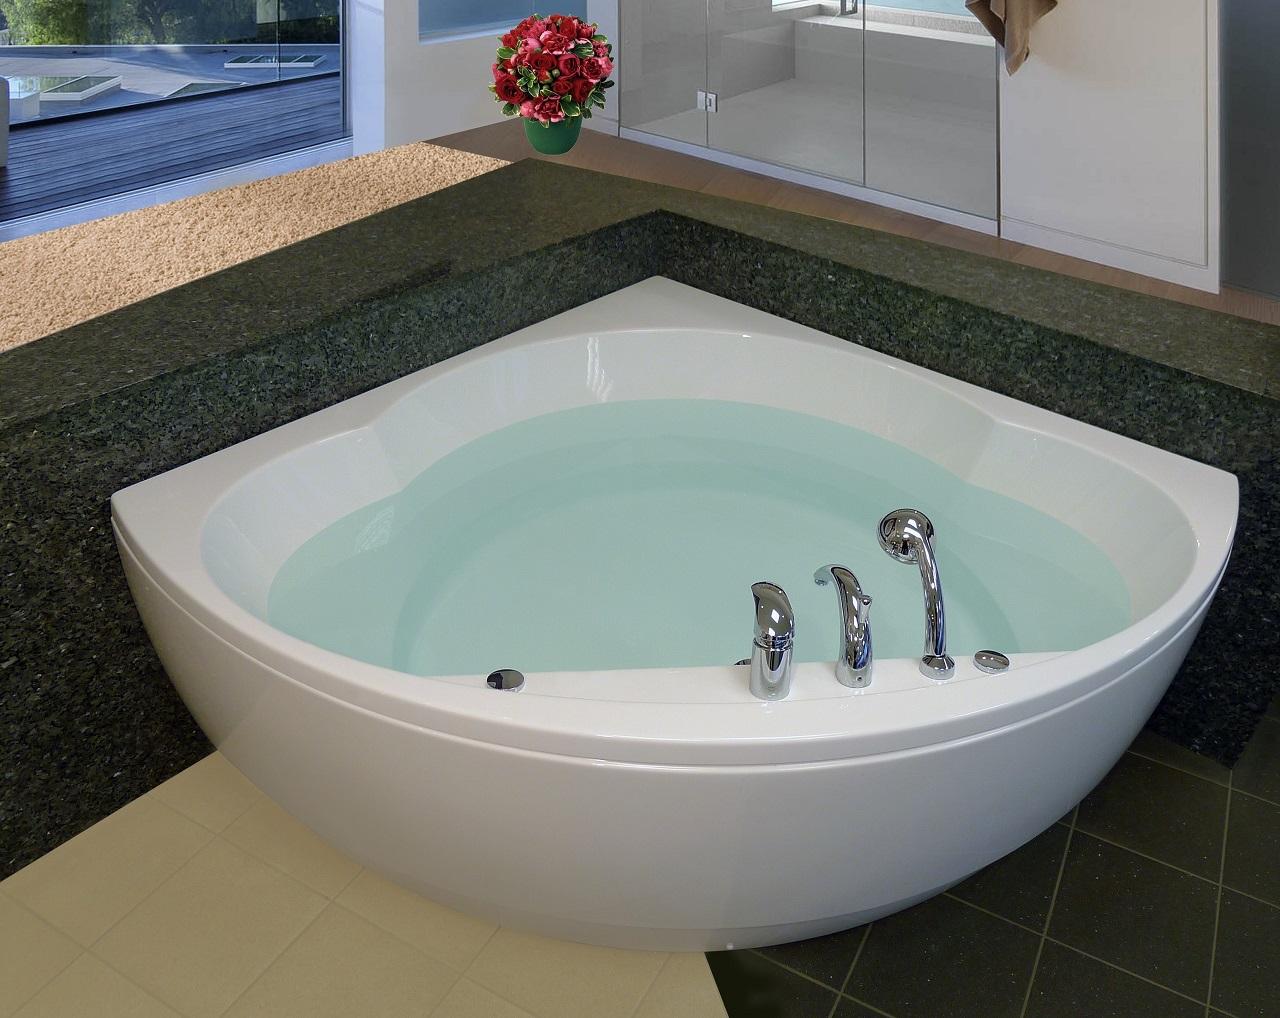 Vasca Da Bagno Dimensioni Standard : Misure vasche angolari misure vasca da bagno piccola affordable